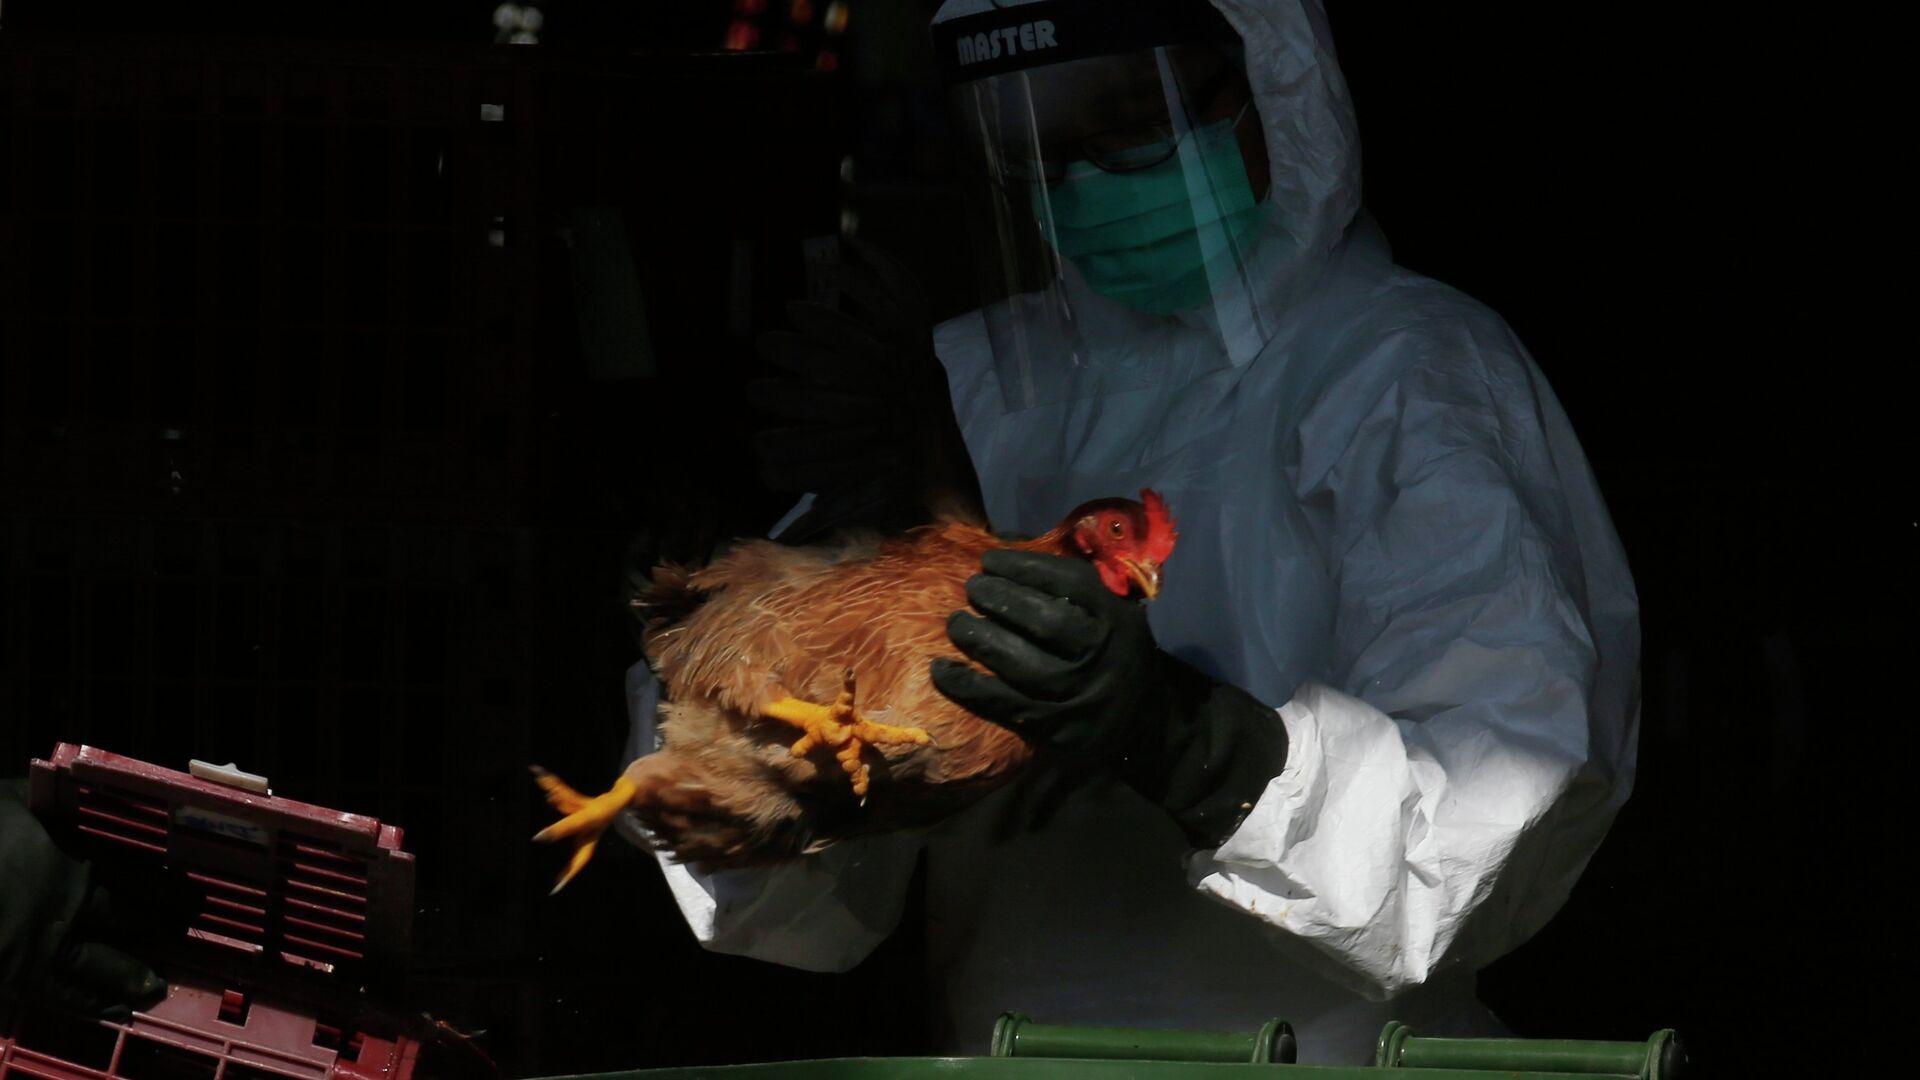 La gripe aviar (imagen referencial) - Sputnik Mundo, 1920, 12.03.2021